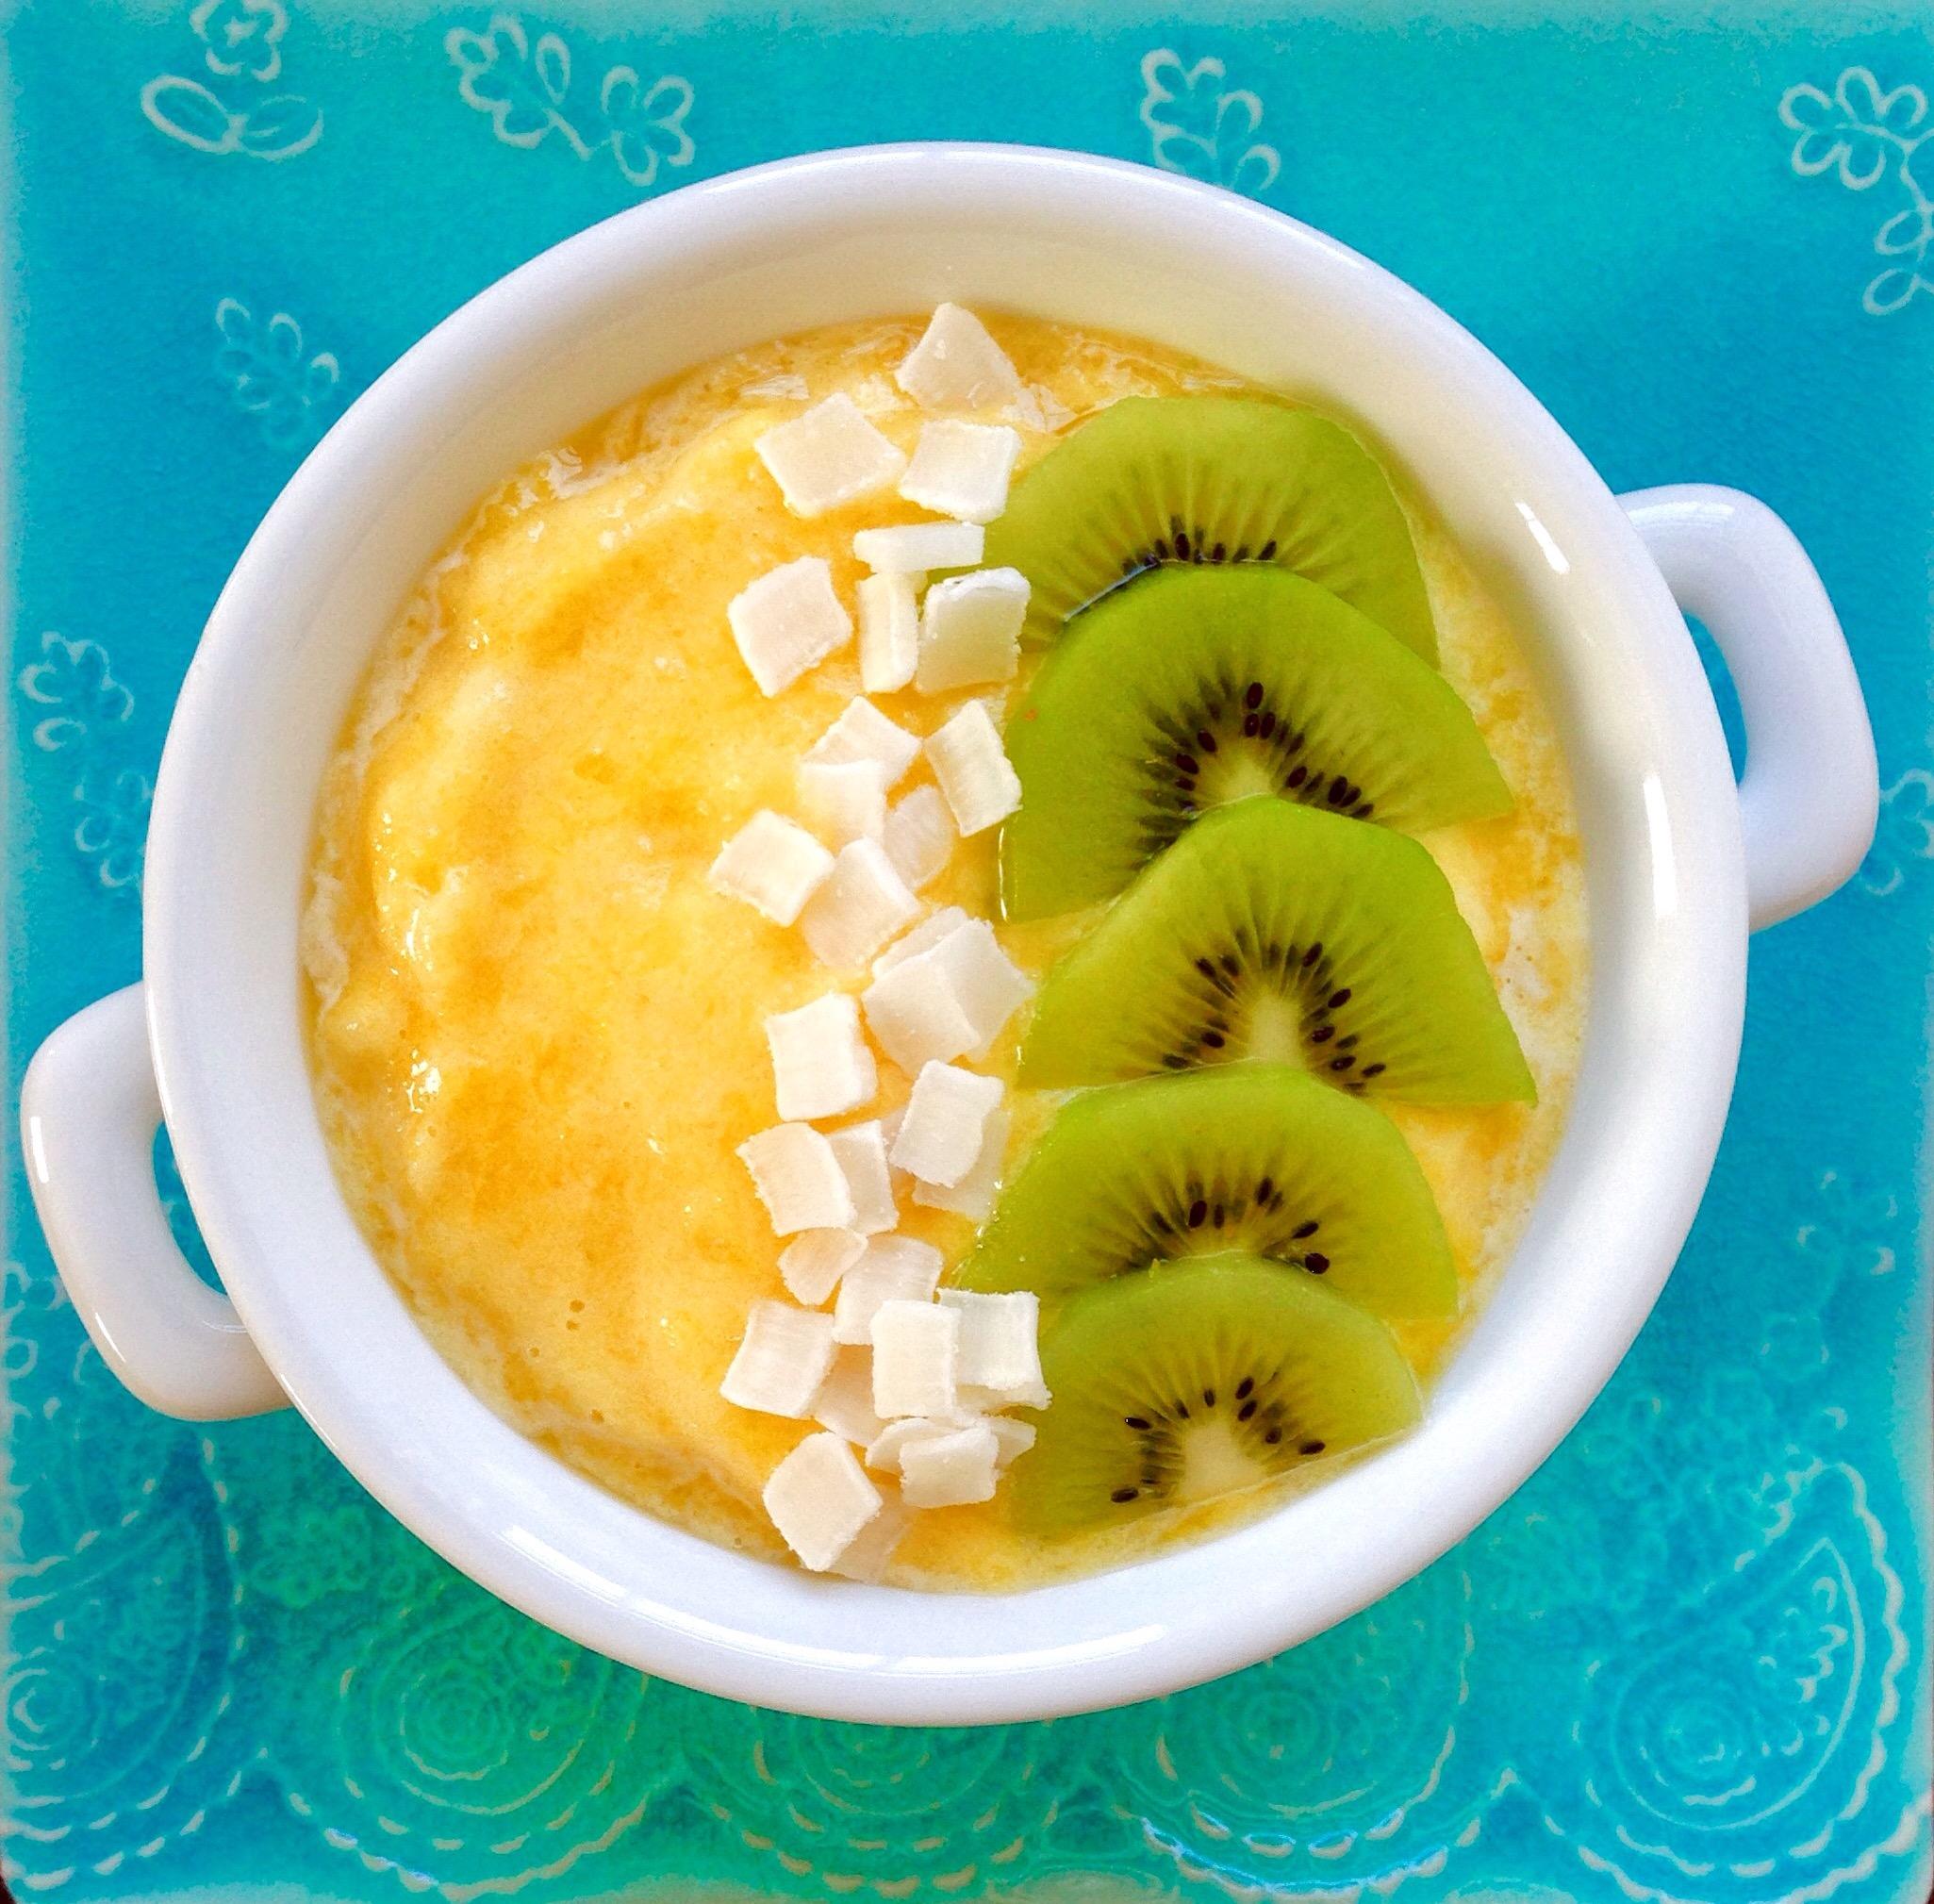 Mango-Pineapple Whip